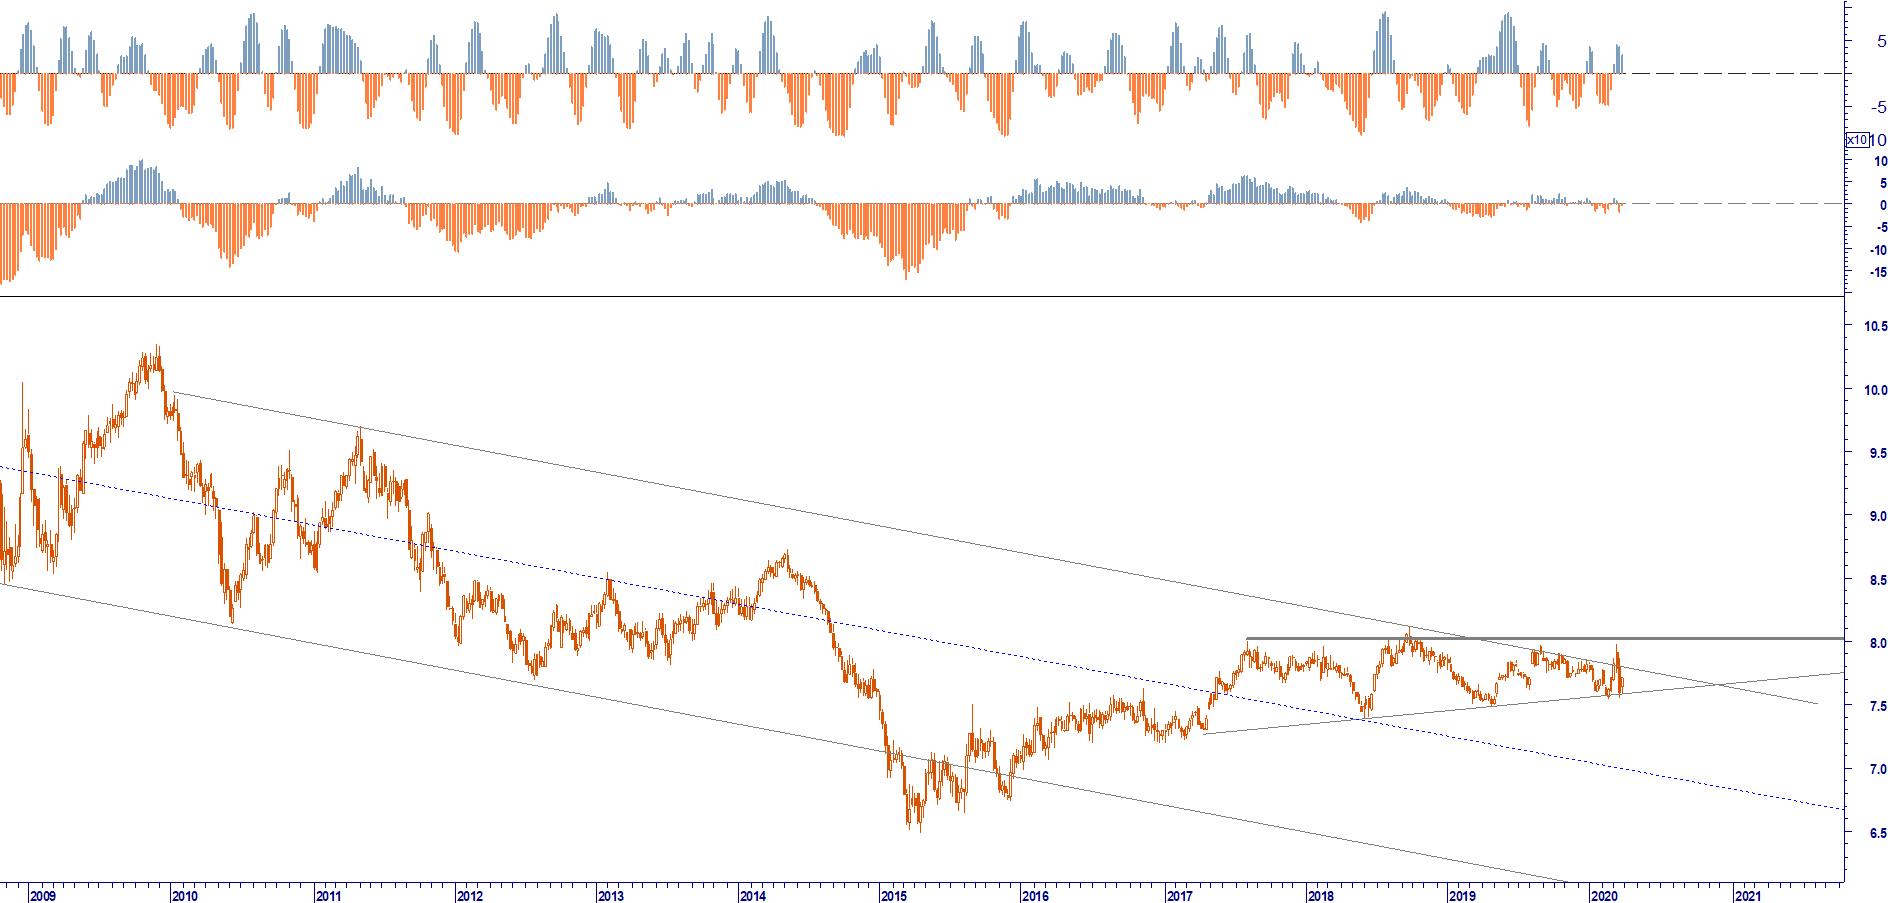 WB FX RISK MANAGEMENT: EUR CNY